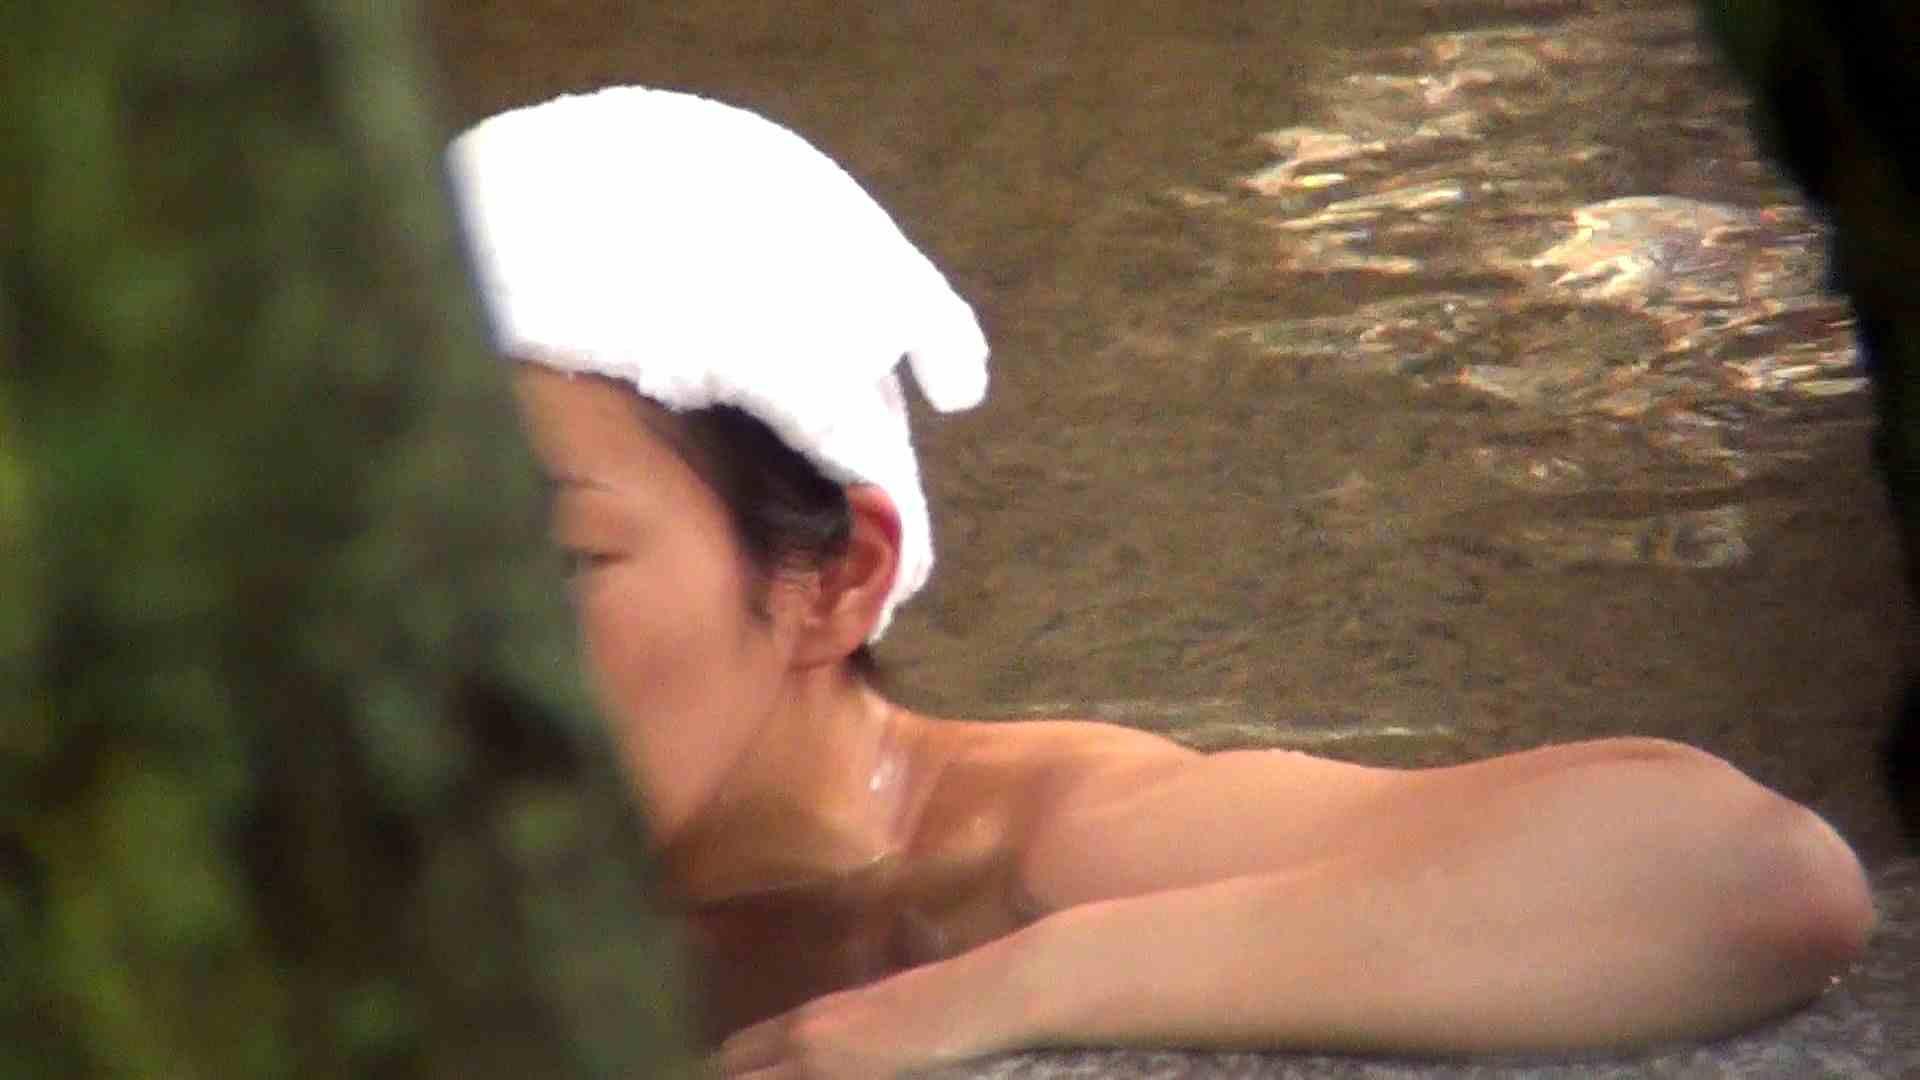 Vol.51 醤油j顔のお女市さん 胸の割りに下半身はがっちりタイプ 美女 ワレメ動画紹介 79画像 43